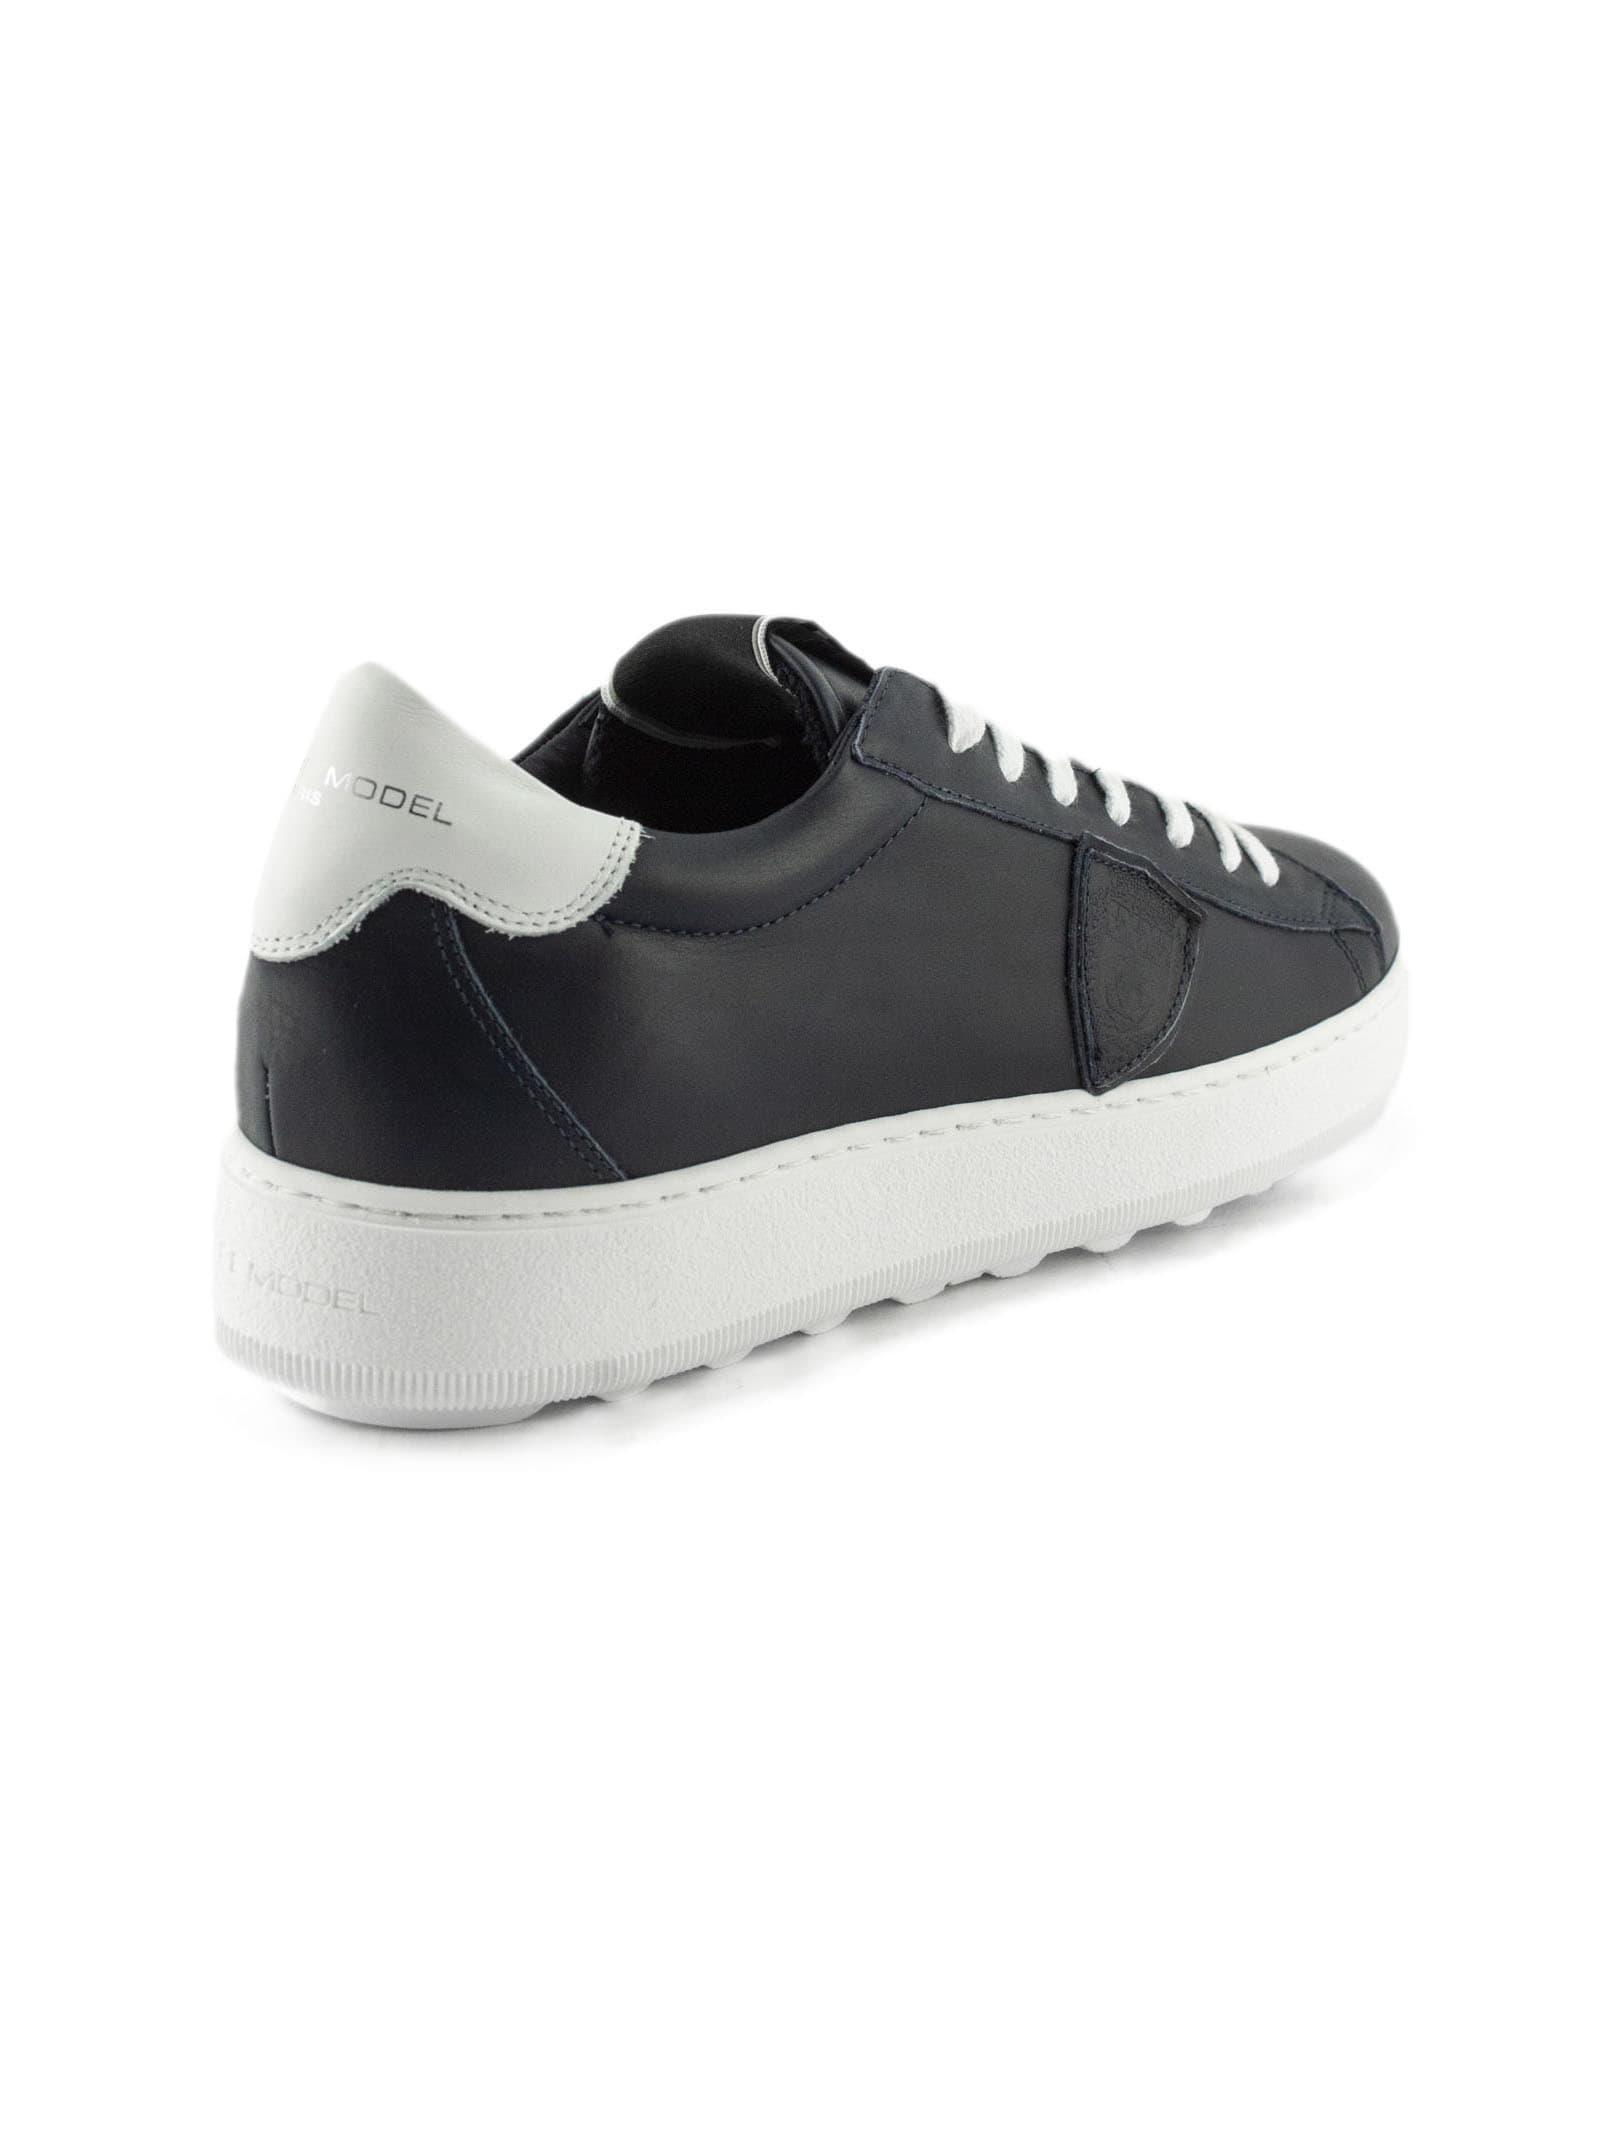 Philippe Model Sneaker Madeleine Blue Leather vnm8OyN0wP